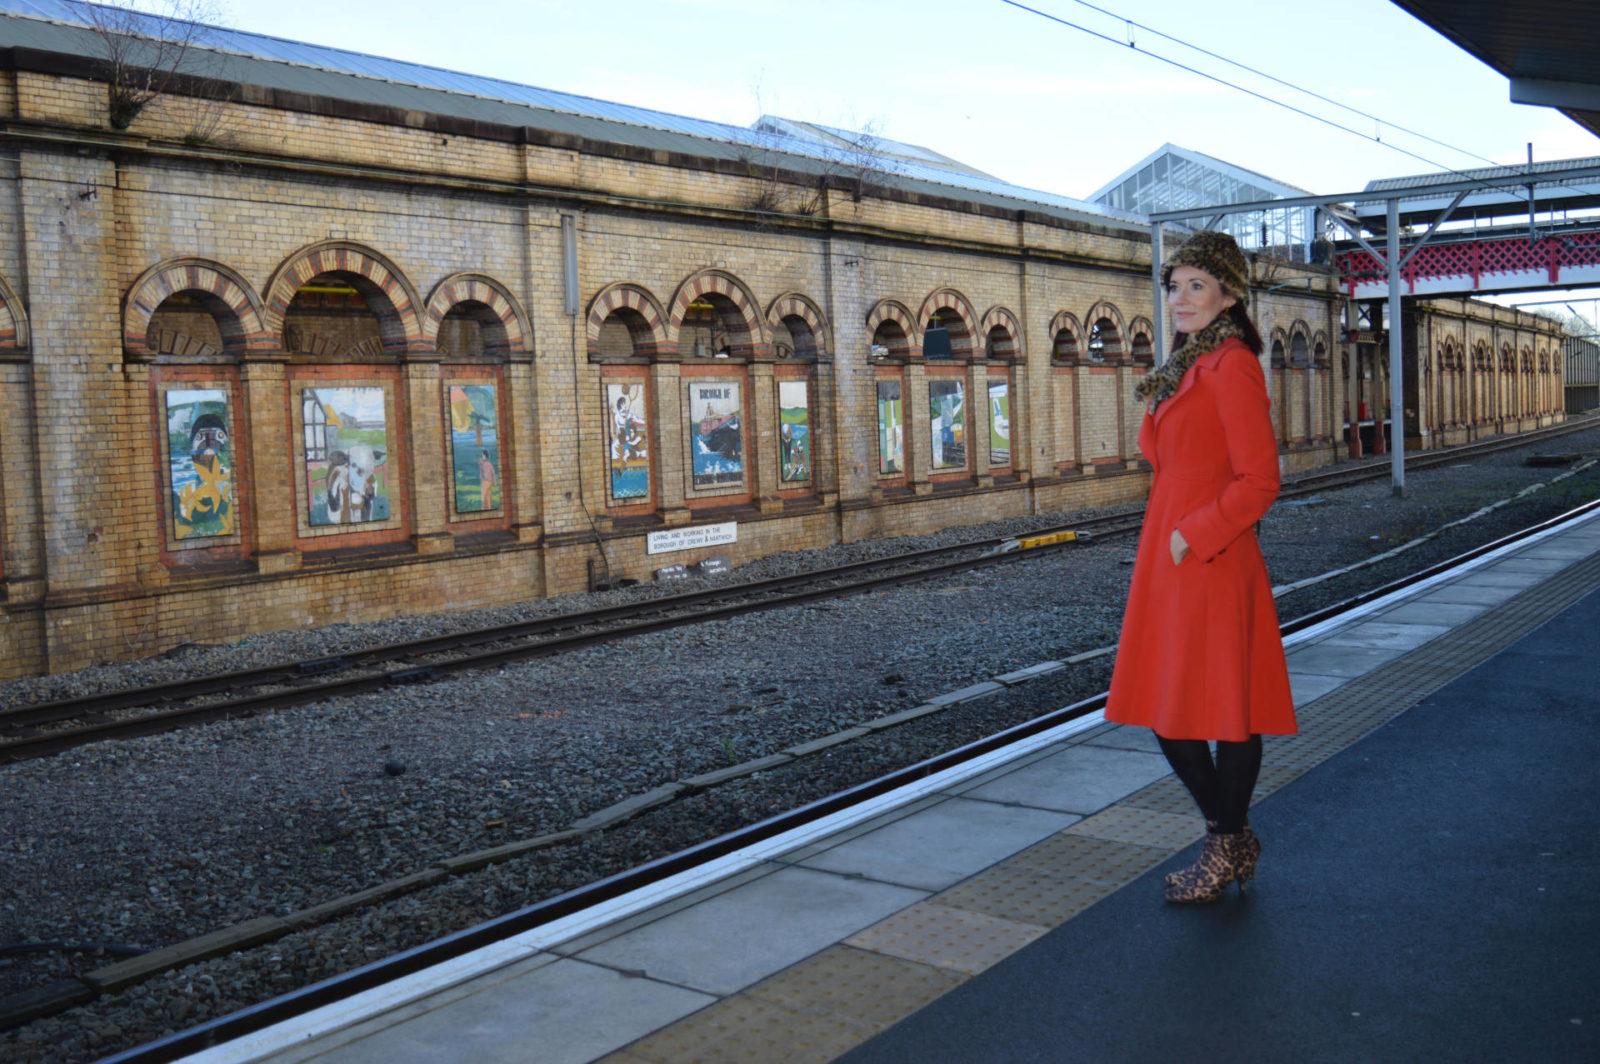 It's a wonderful life - the importance of kindness at Christmas #itsawonderfulline Crewe station